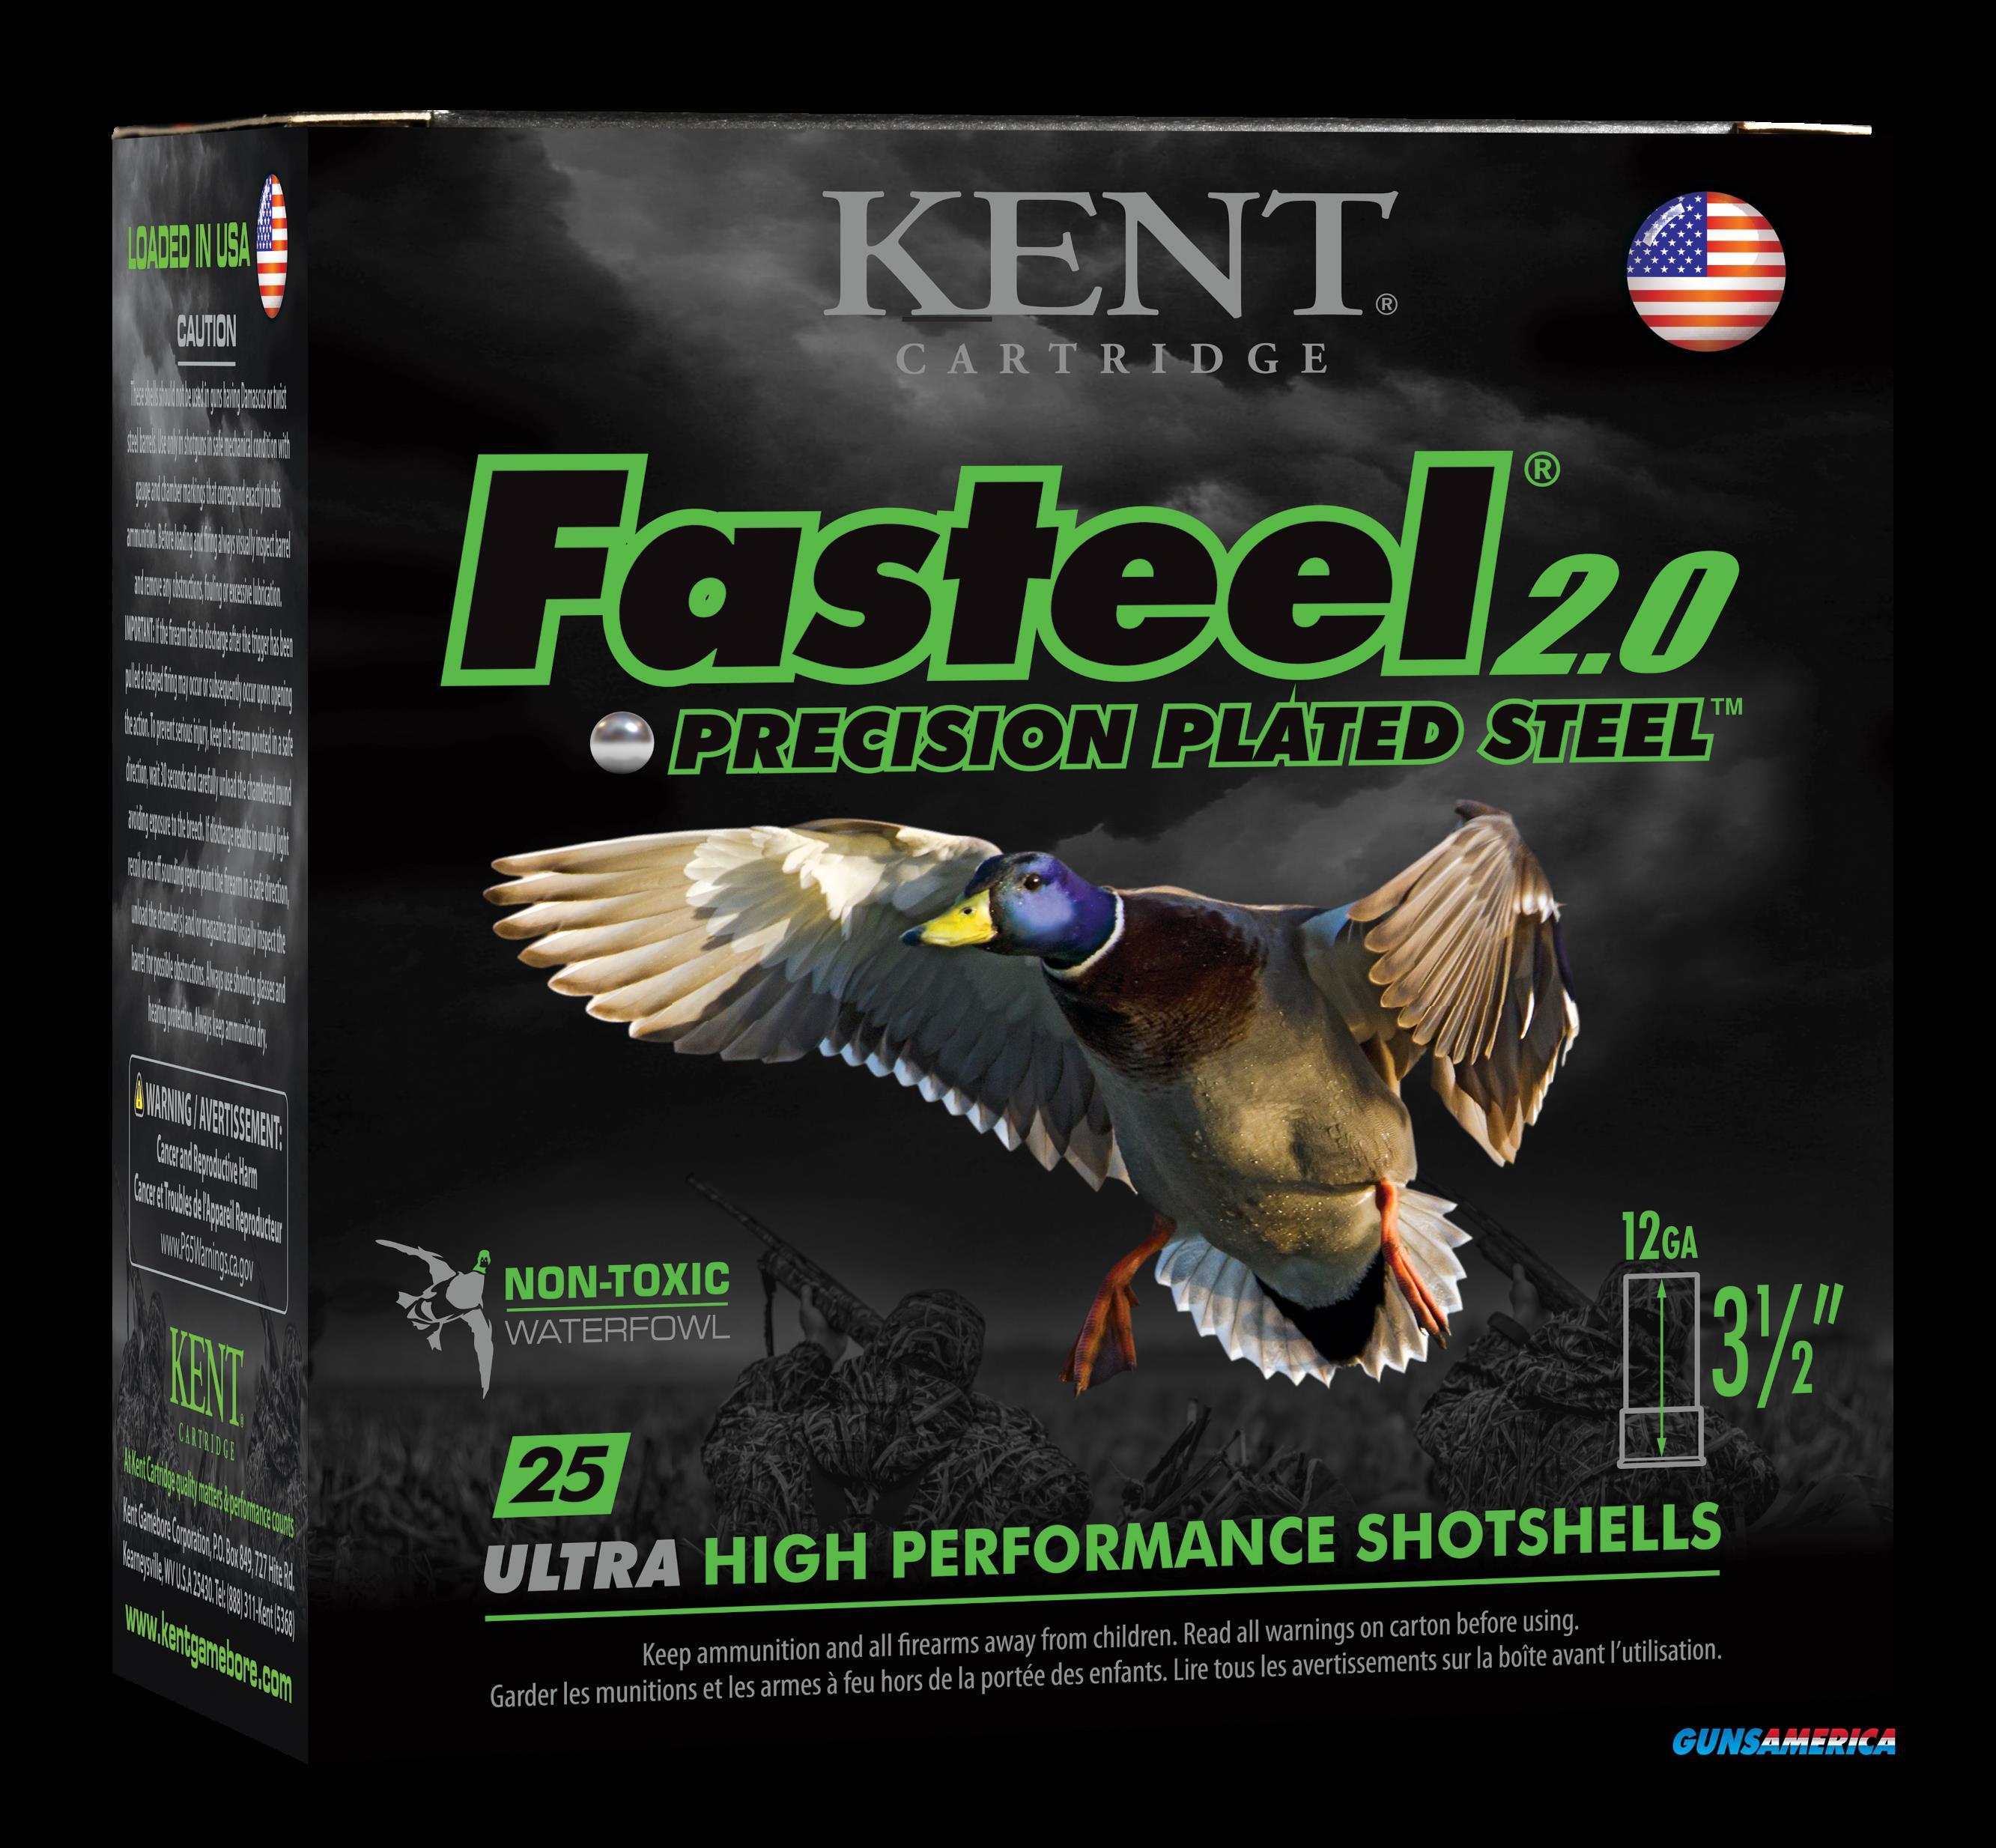 Kent Cartridge Fasteel 2.0, Kent K1235fs404   3.5 13-8   Faststl 2.0     25-10  Guns > Pistols > 1911 Pistol Copies (non-Colt)